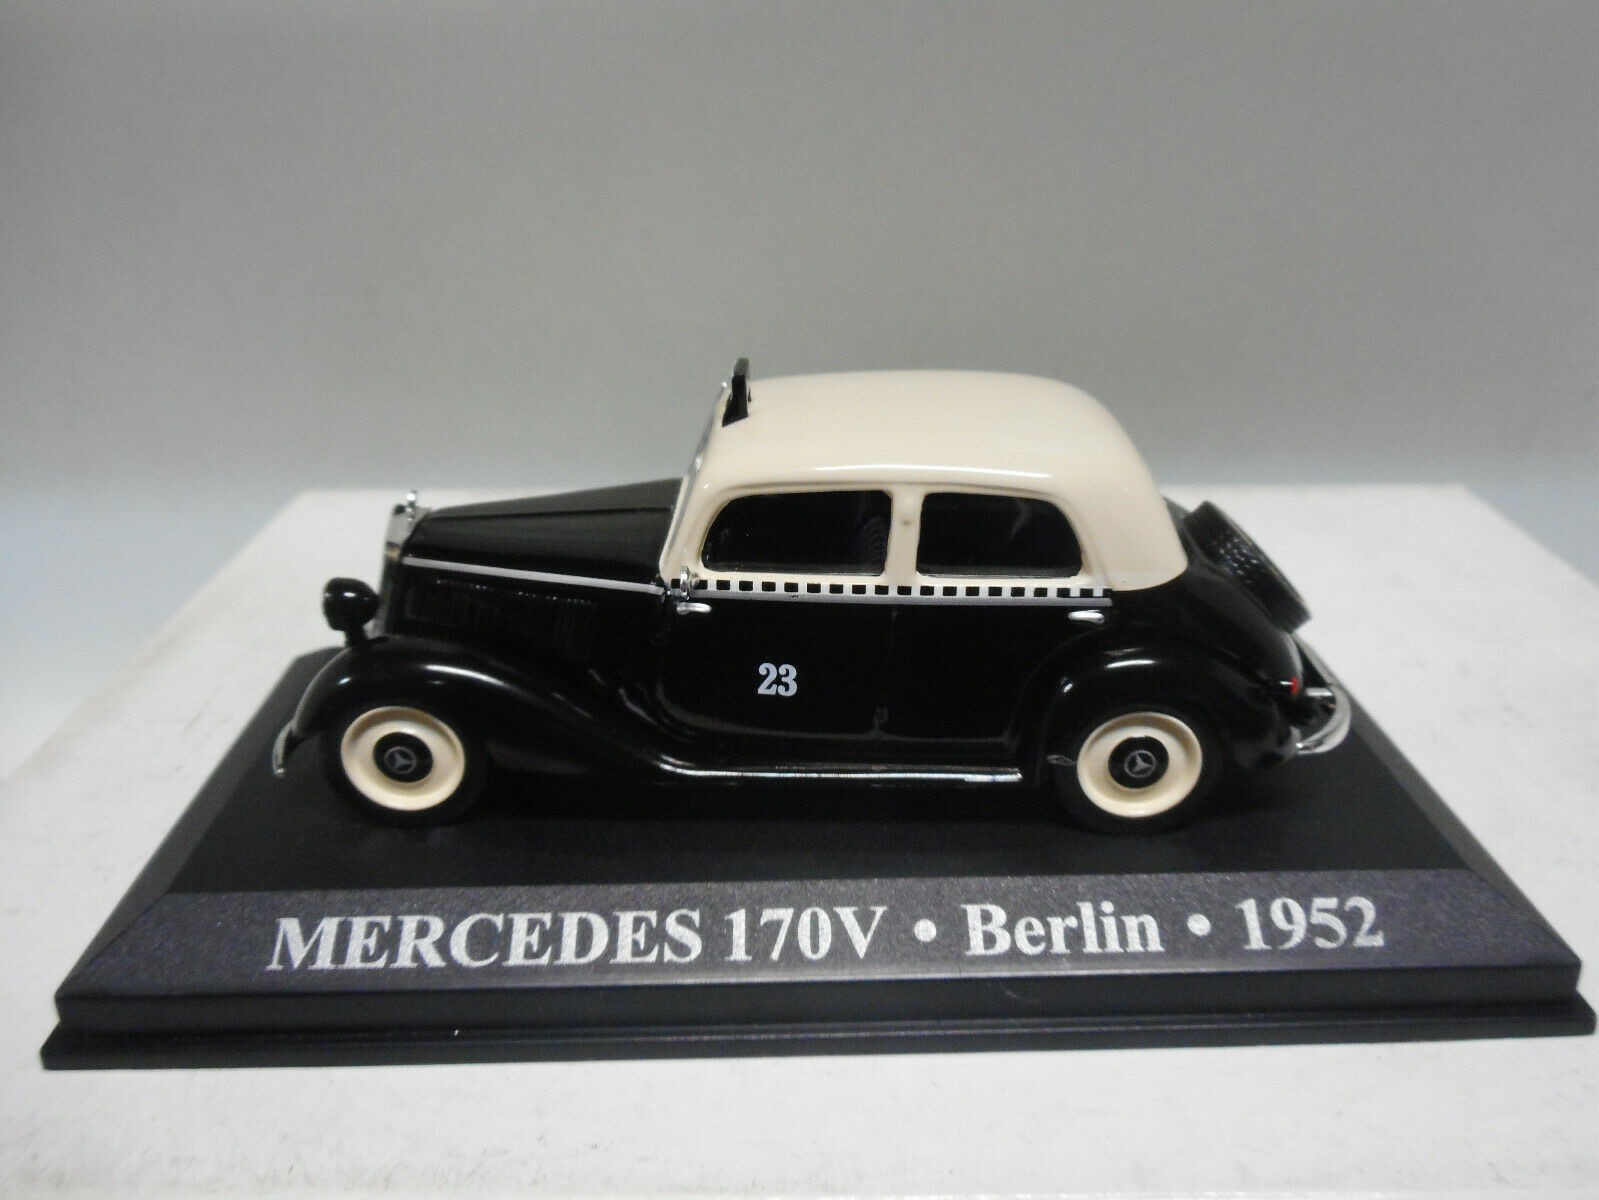 MERCEDES-BENZ 170V TAXI BERLIN 1952 ALTAYA IXO 1:43